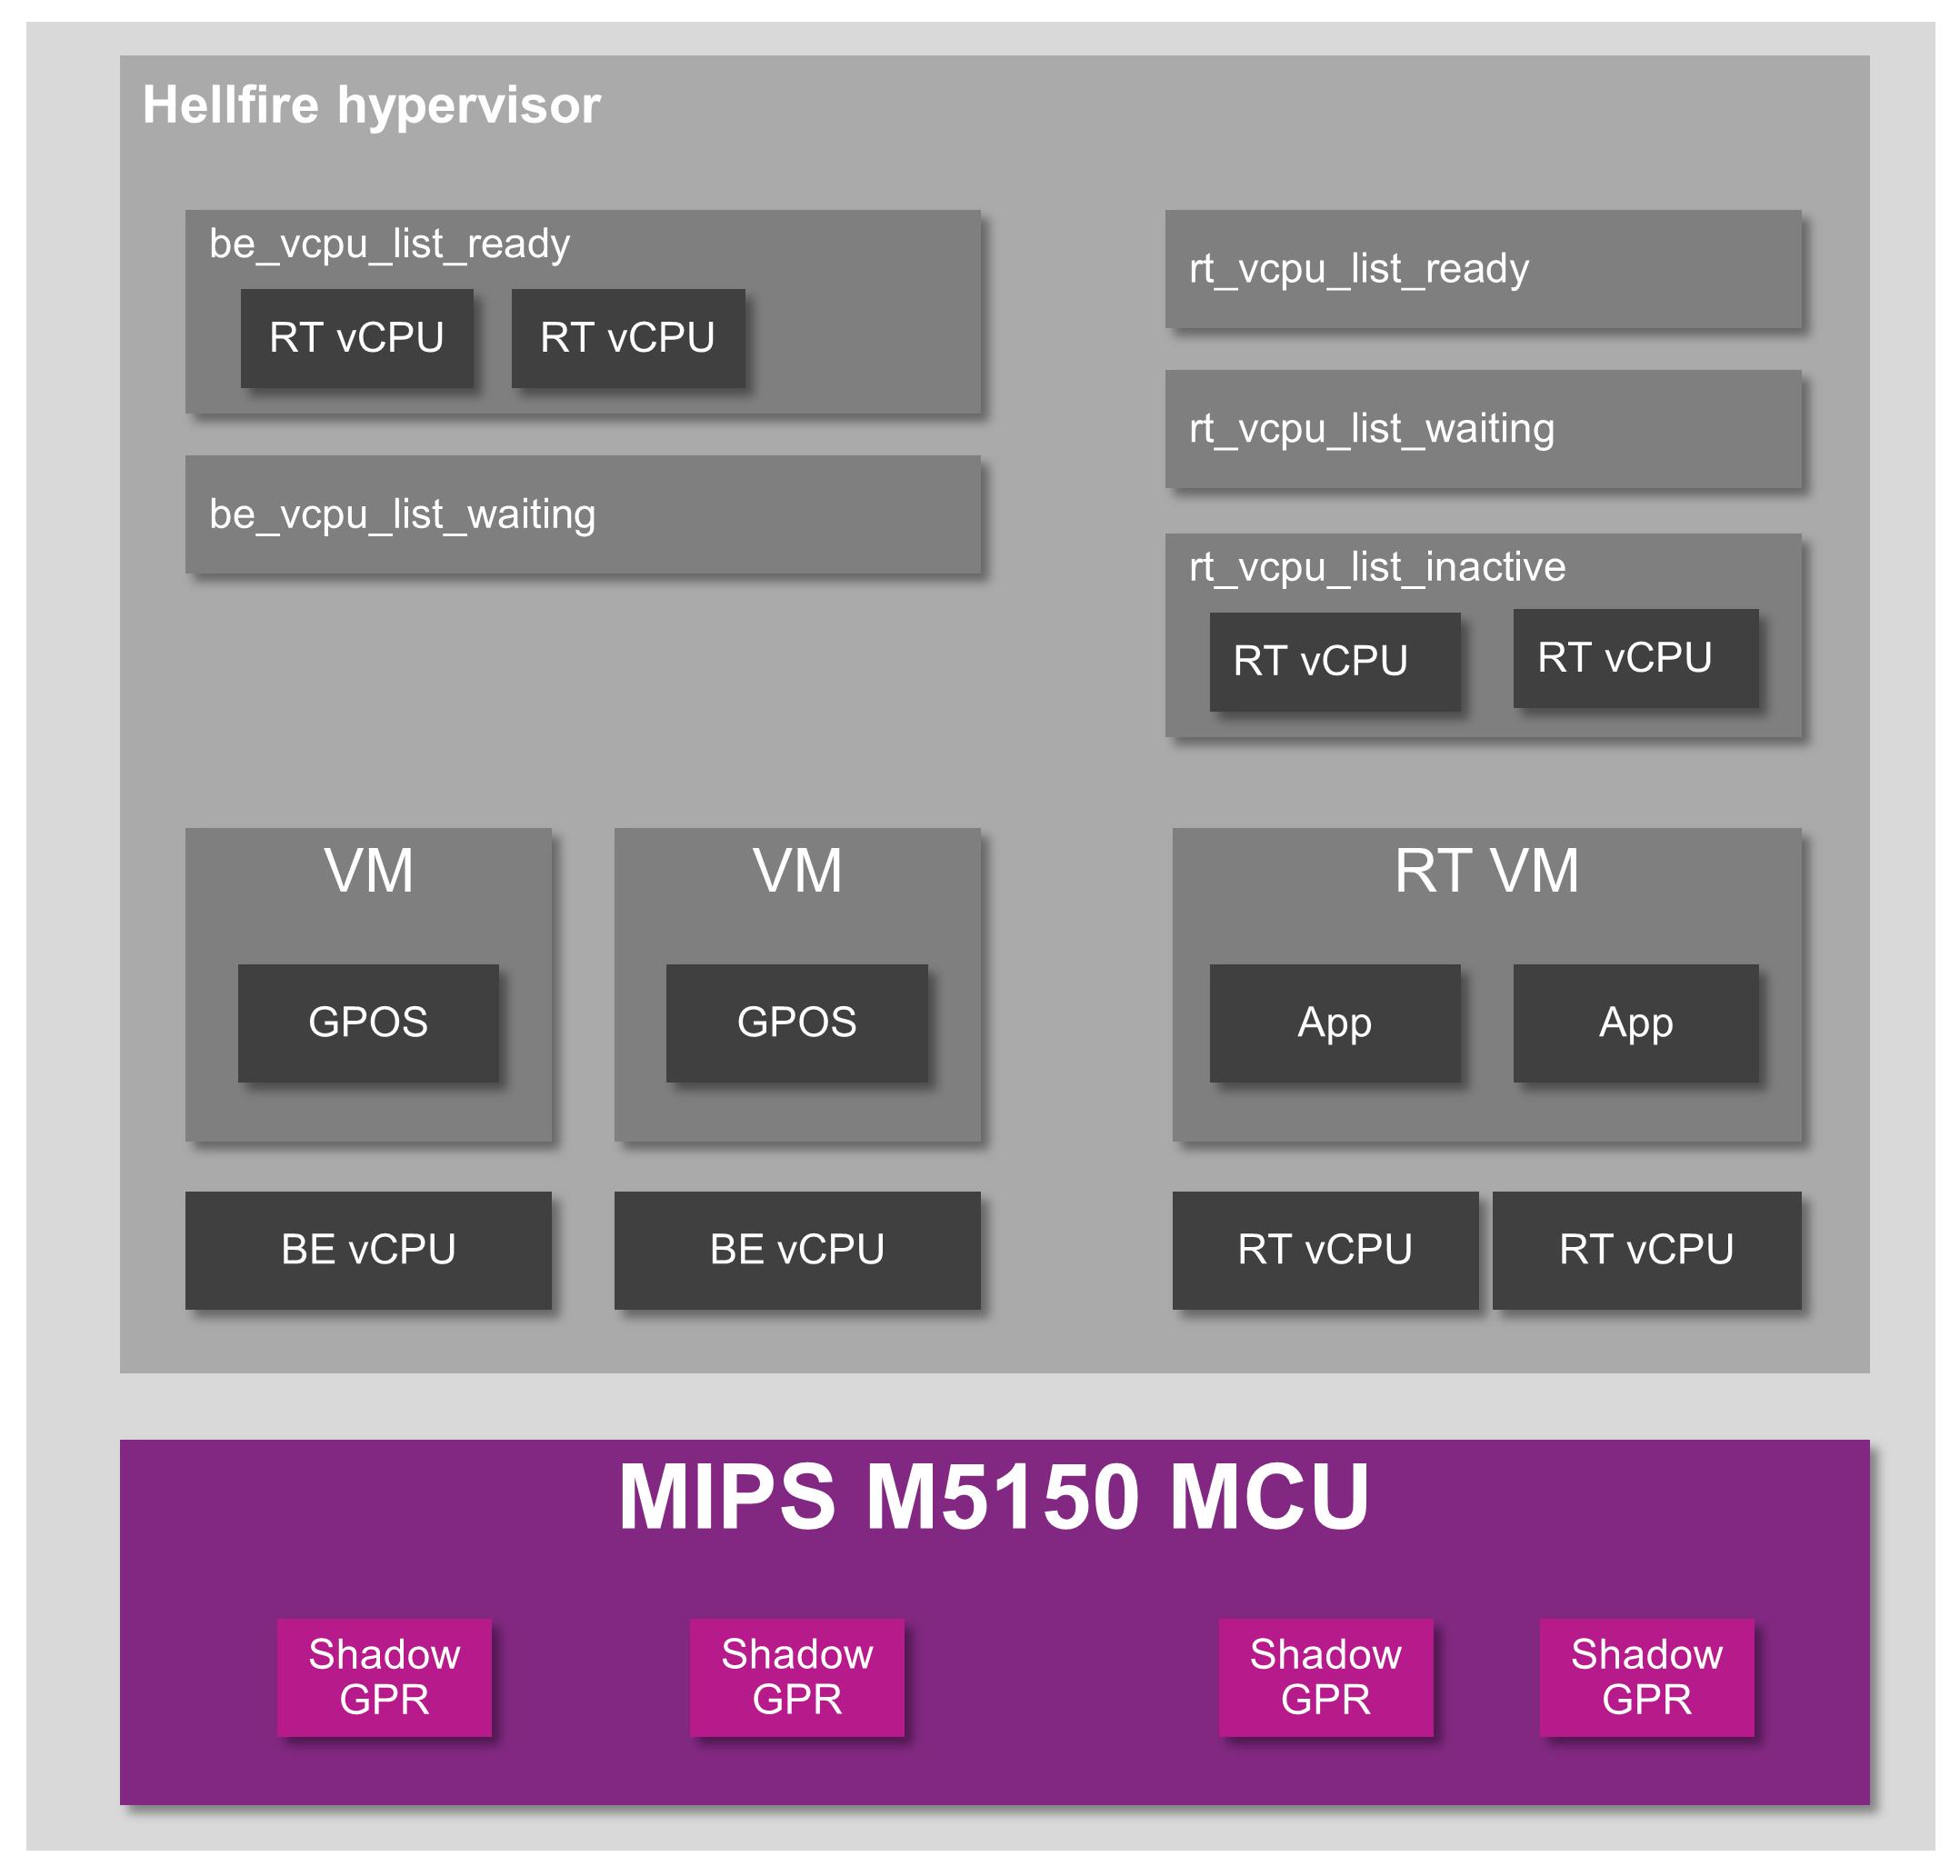 Hellfire hypervisor - sw architecture